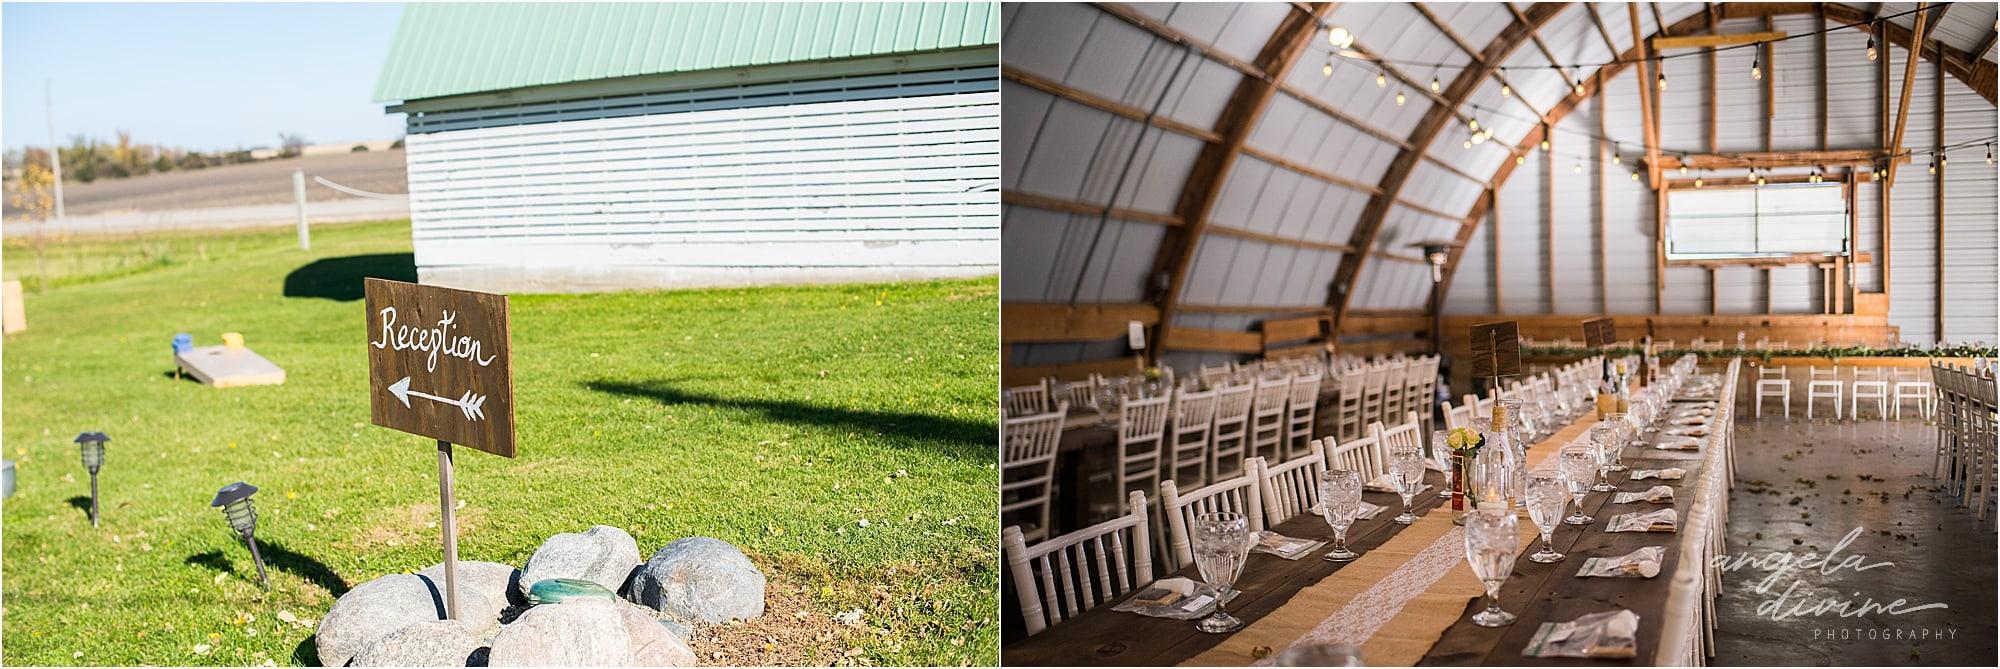 The Cottage Farmhouse Wedding Reception details